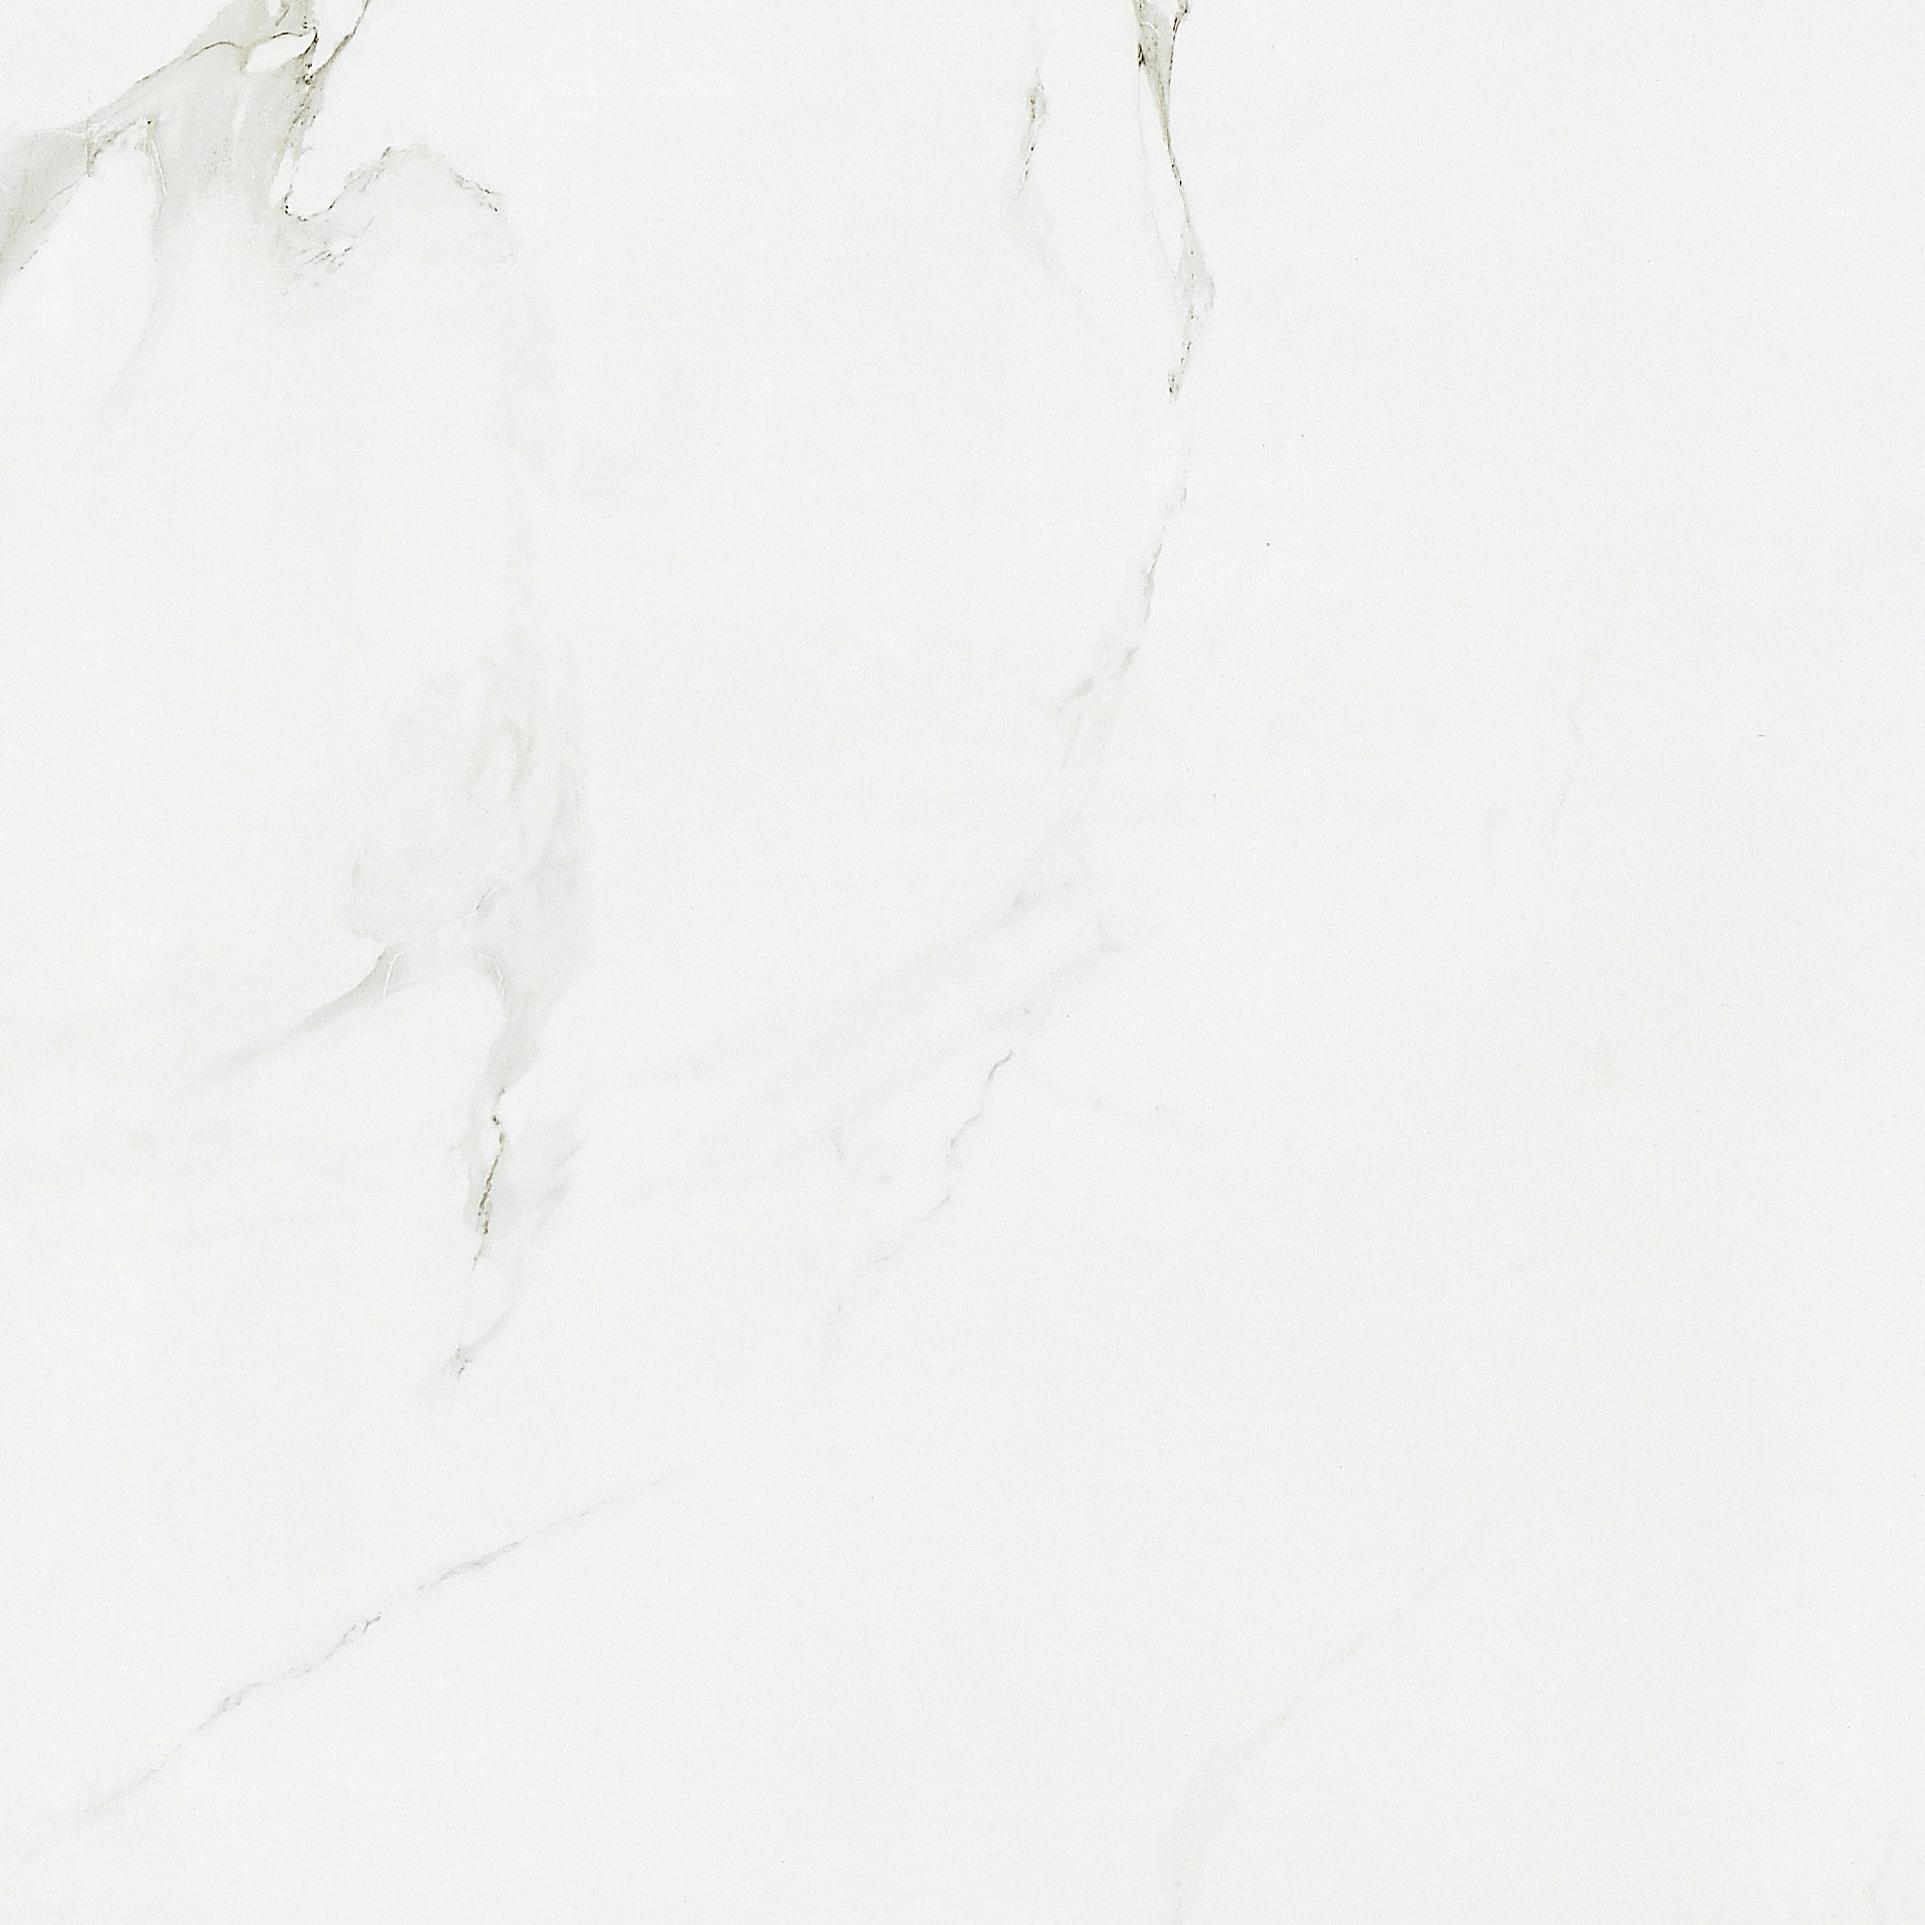 雅士白HPG80052,800x800mm; HPG26052,600x1200mm;